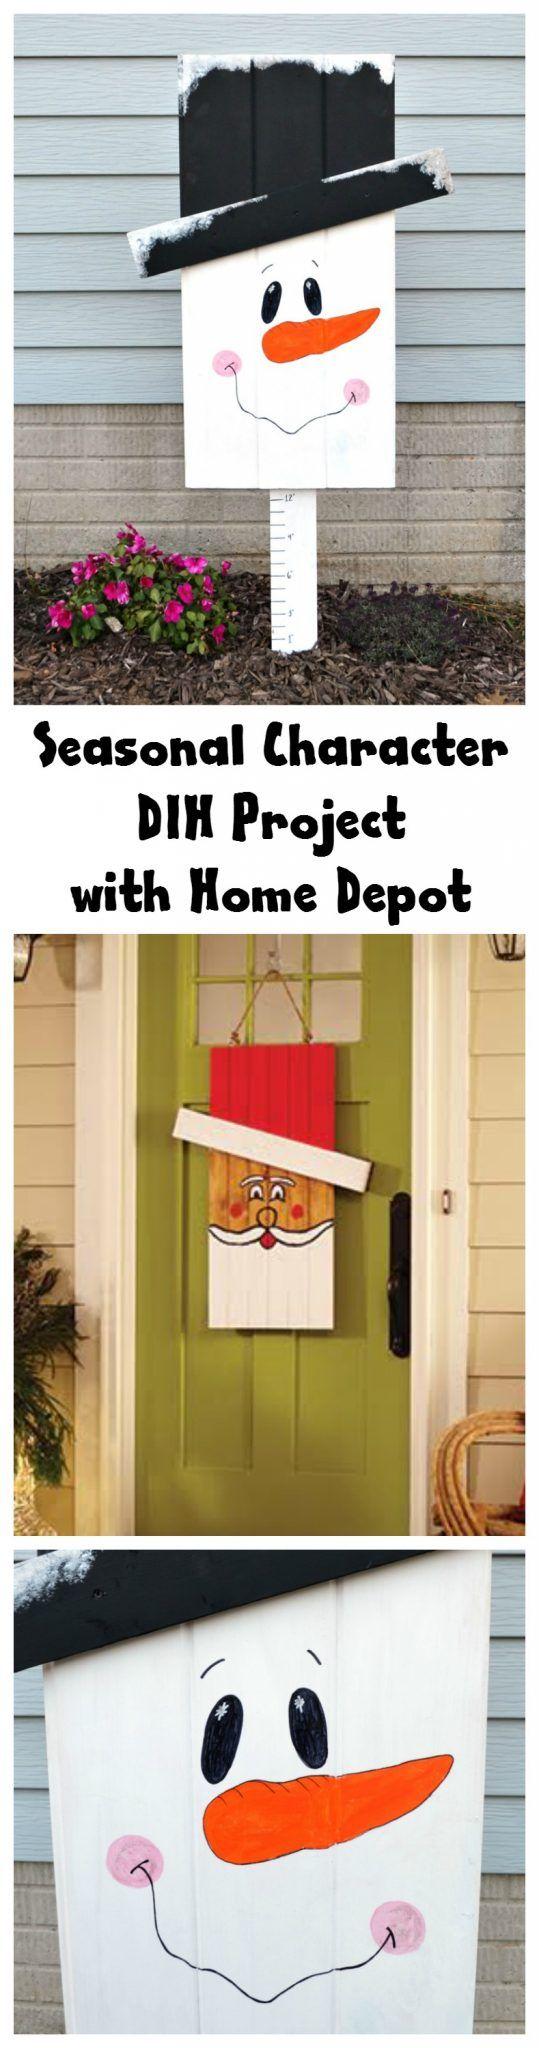 Home Depot DIH Party Seasonal Character Amy